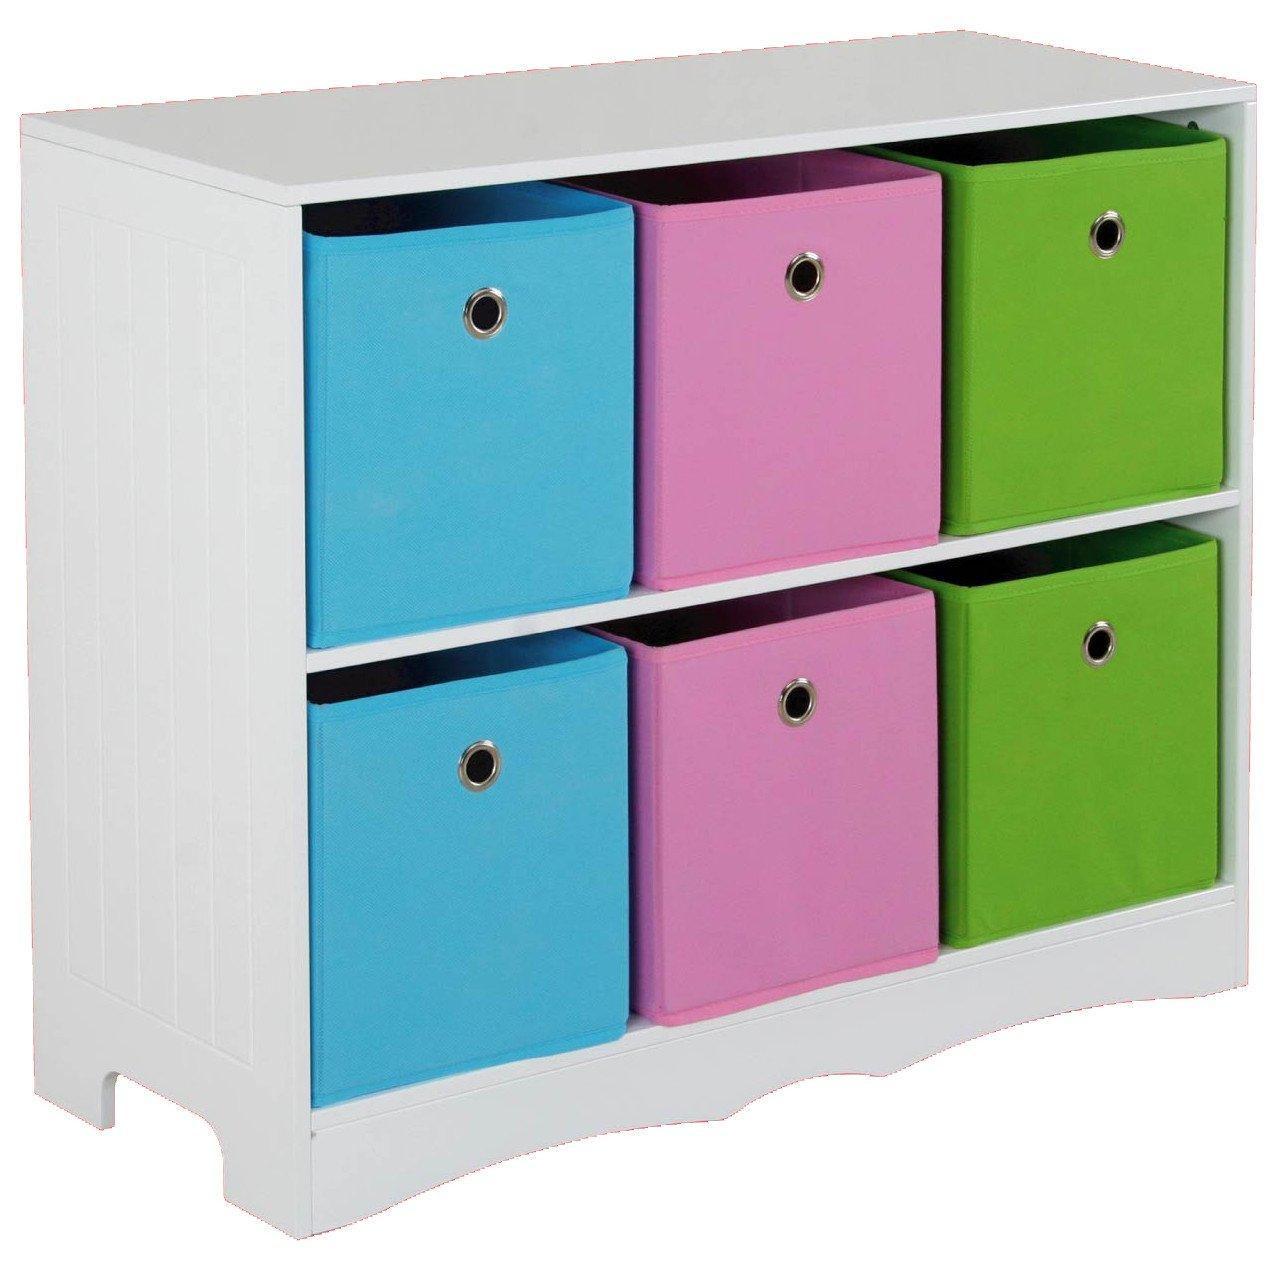 Home Basics Toy Organizer, Kids Toy Storage